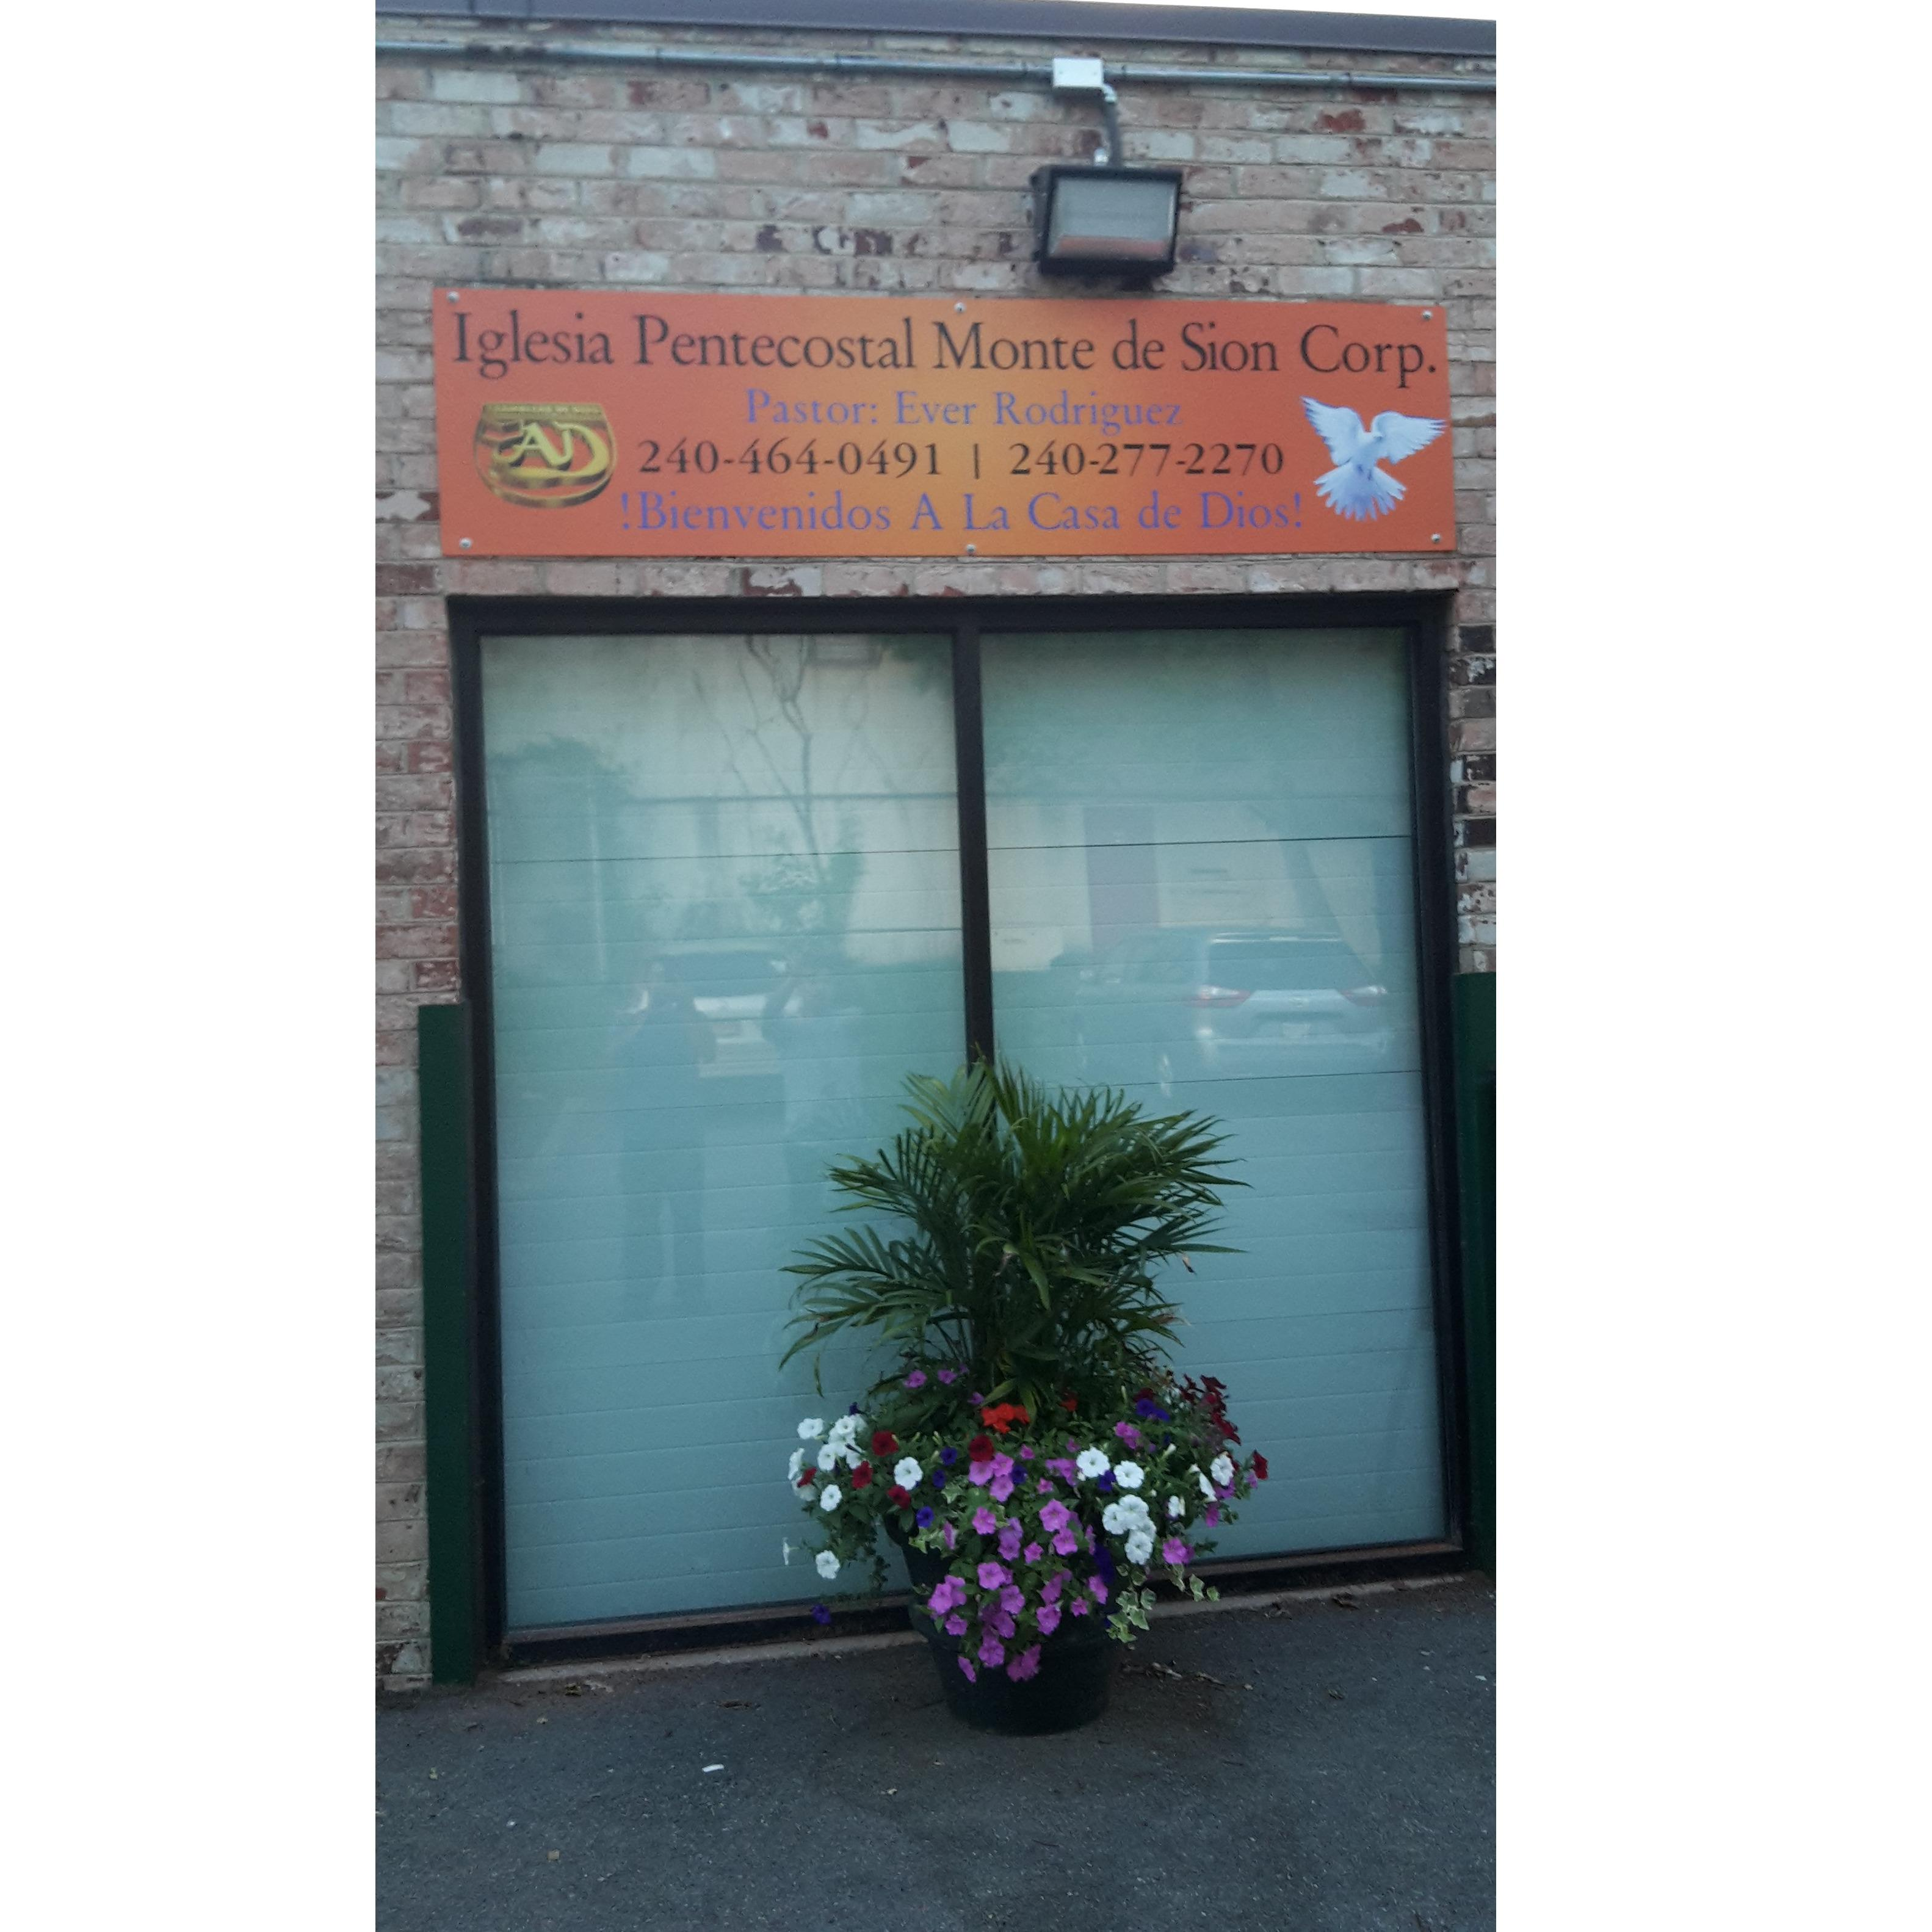 Iglesia Pentecostal Monte De Sion